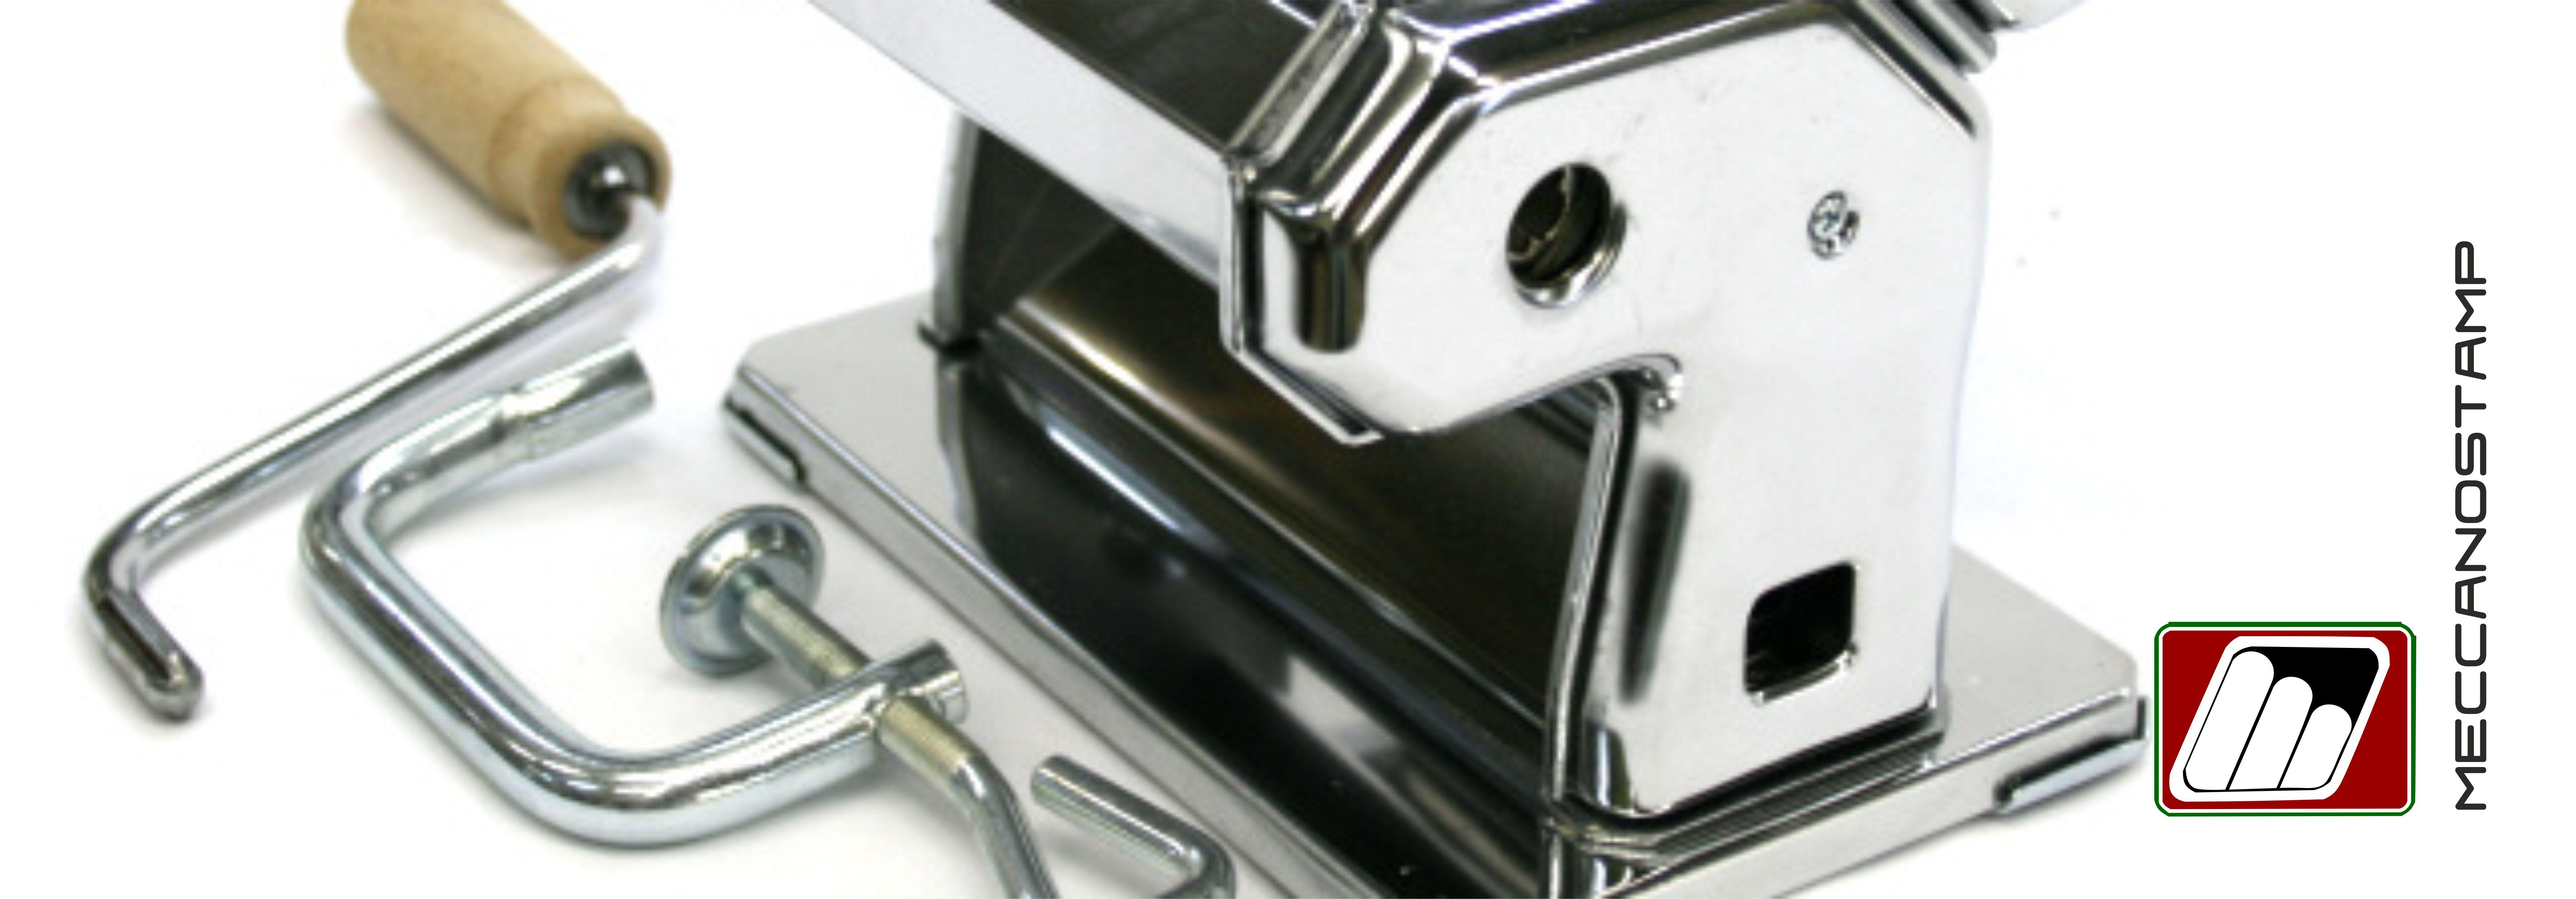 Particolari di casalinghi meccanostamp - Casalinghi design ...